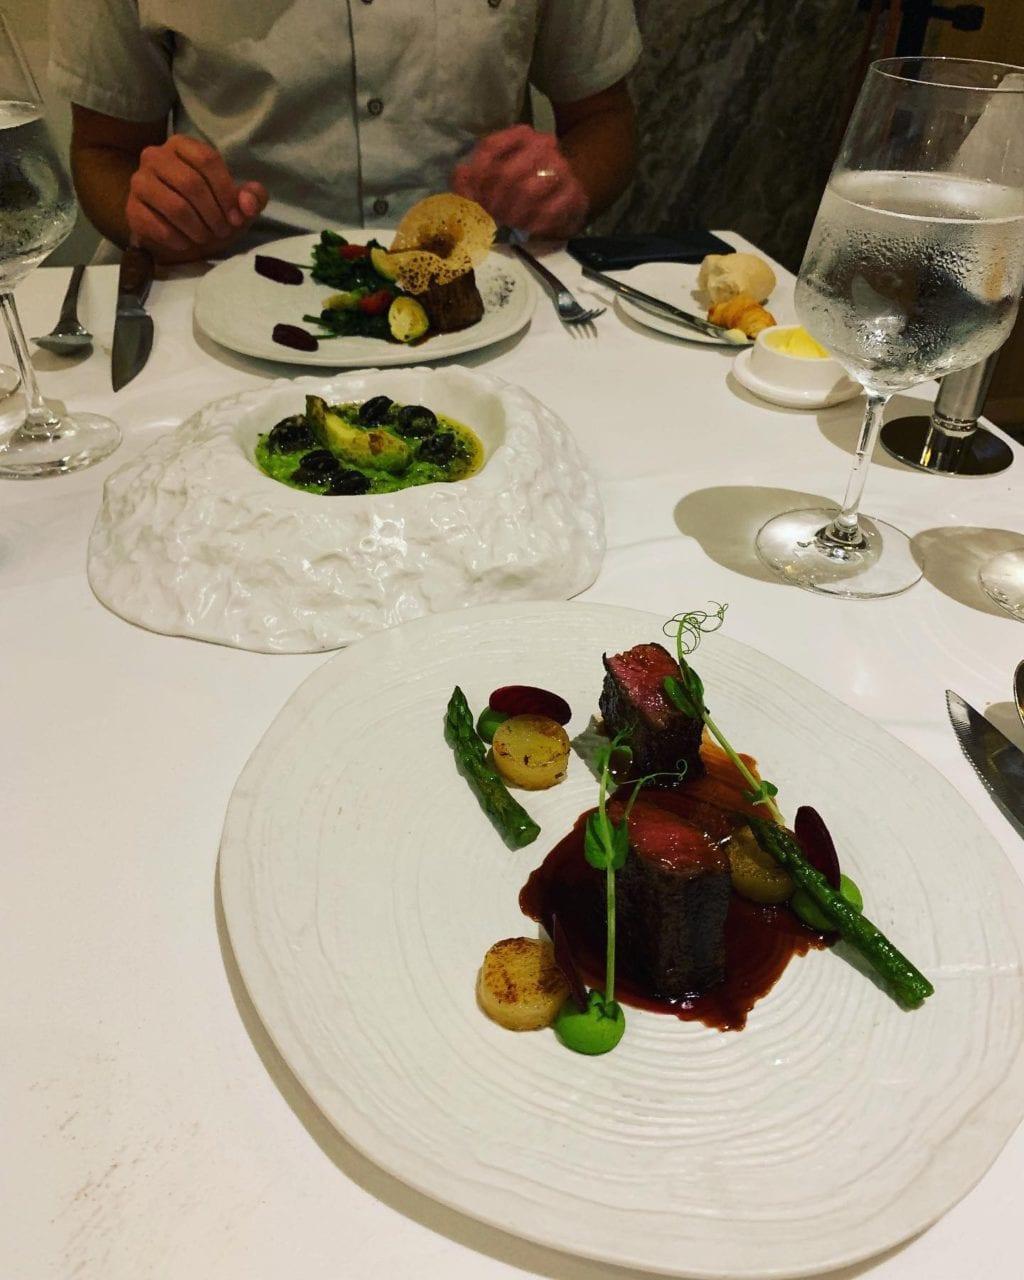 Lamb, Escargot Risotto, Petite Filet